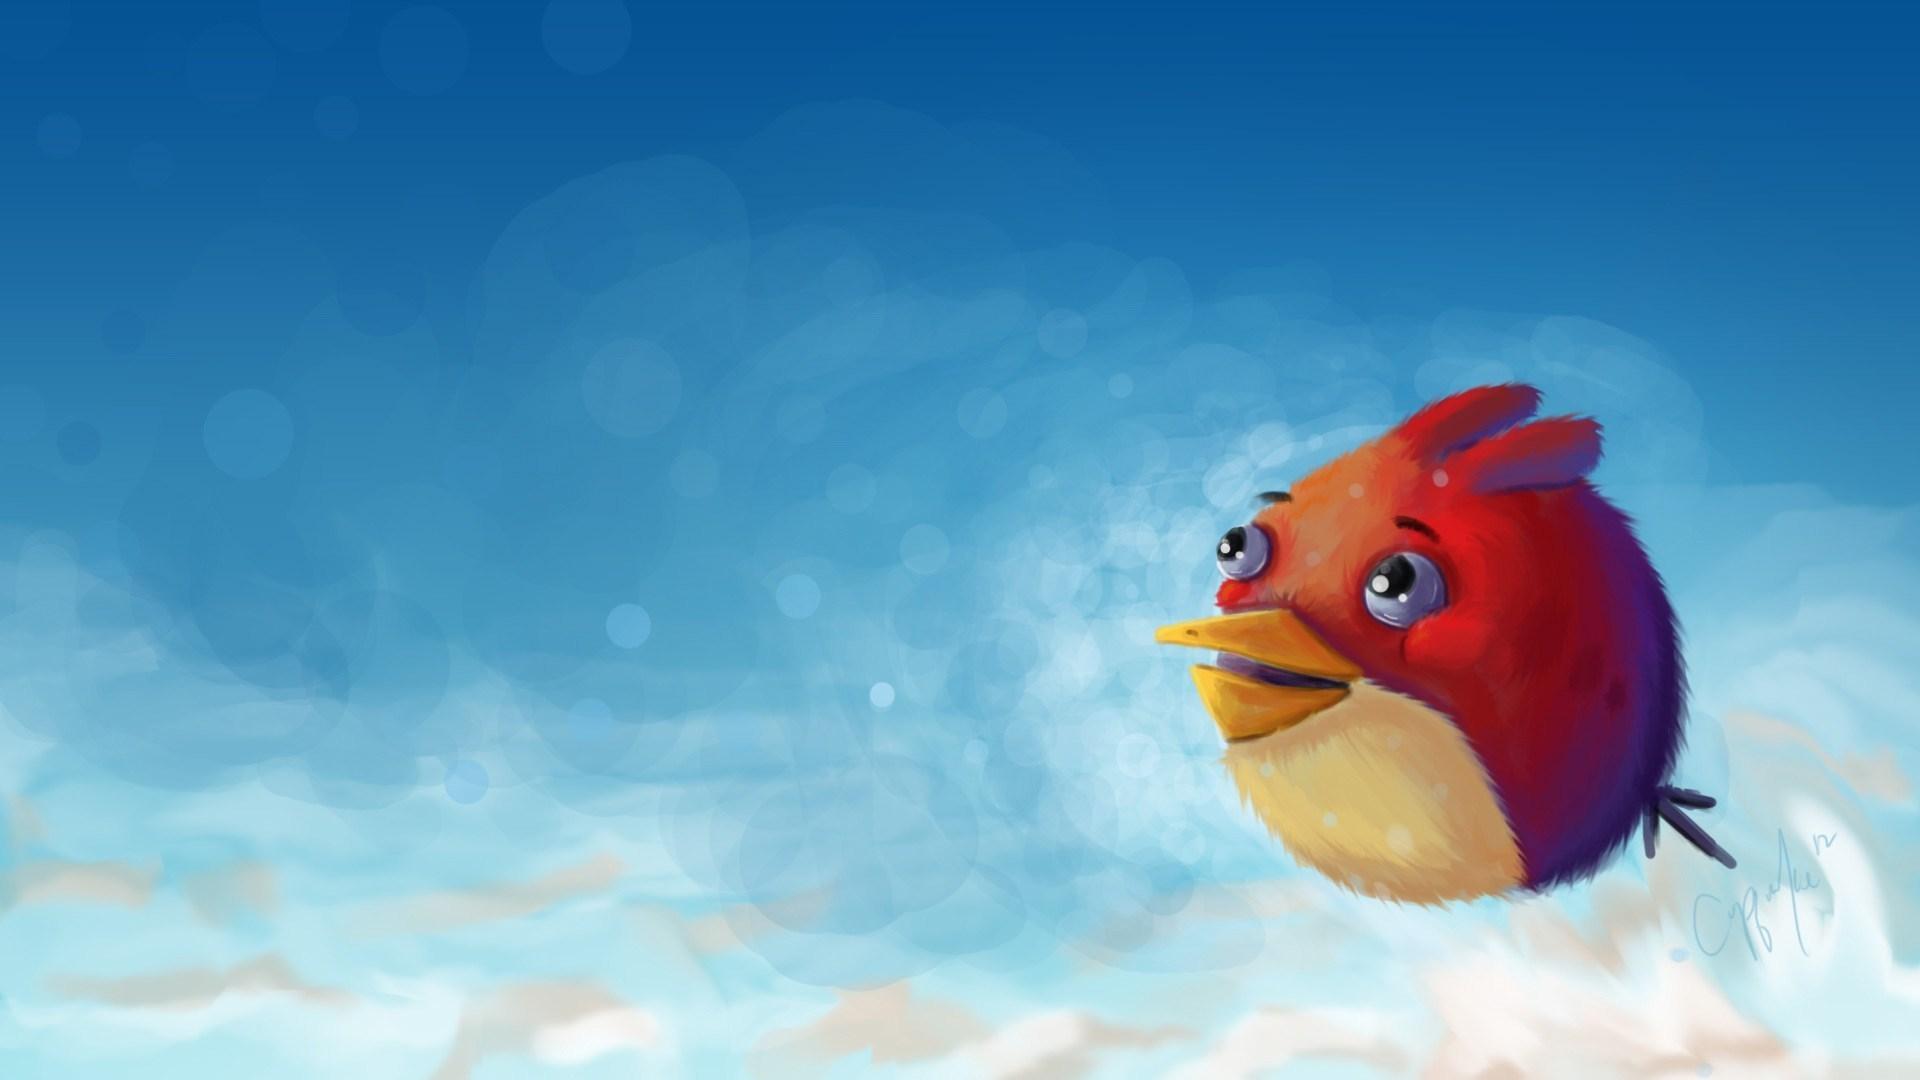 Angry Bird Artwork